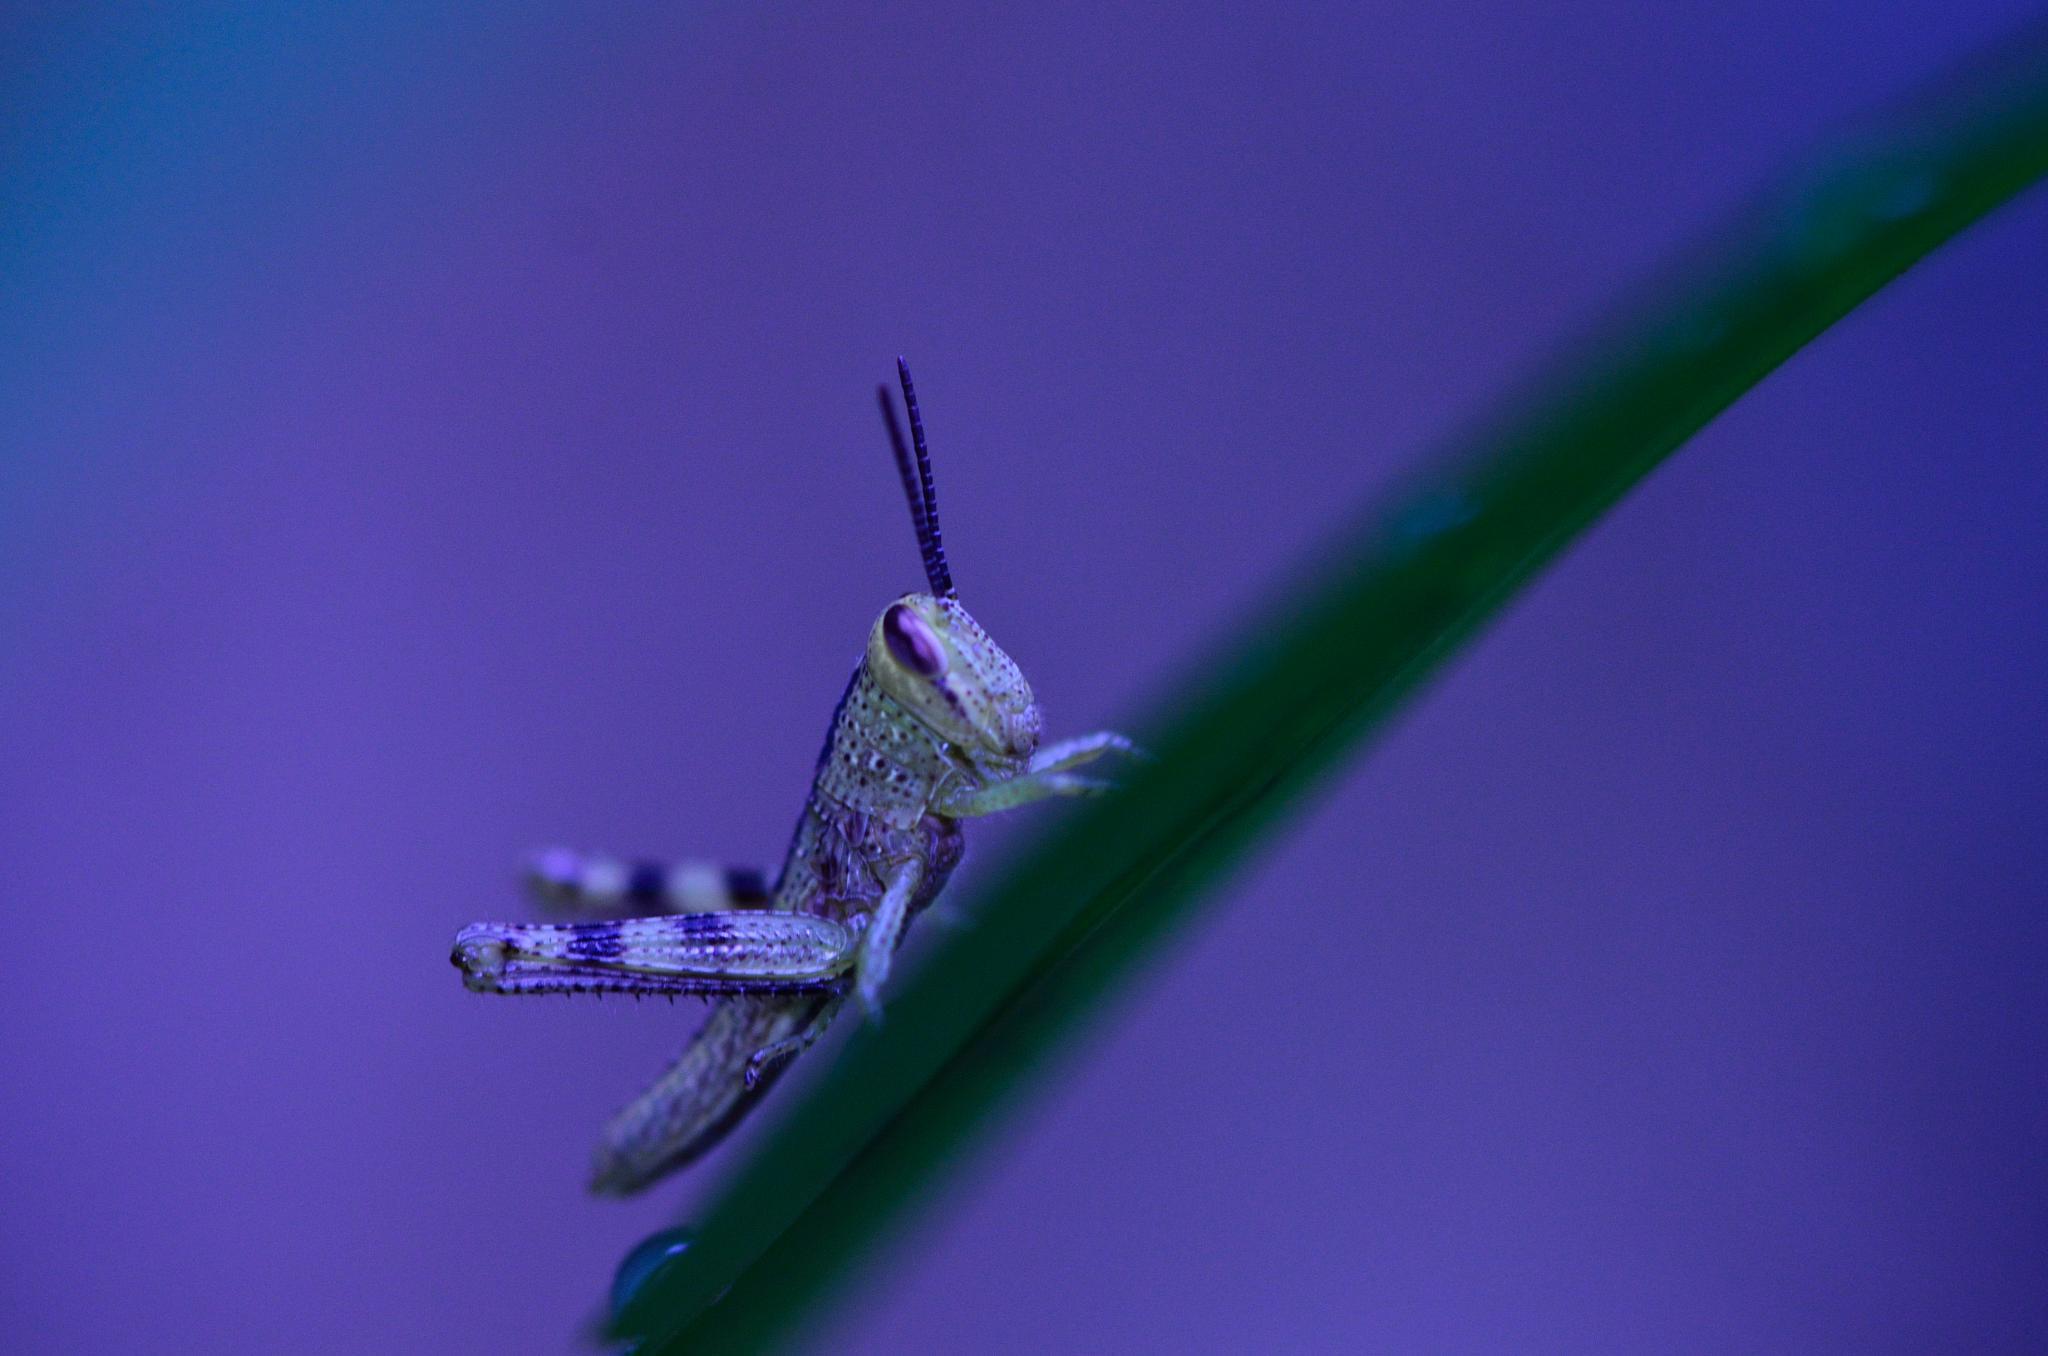 Grass Hopper  by Yulius B Susilo